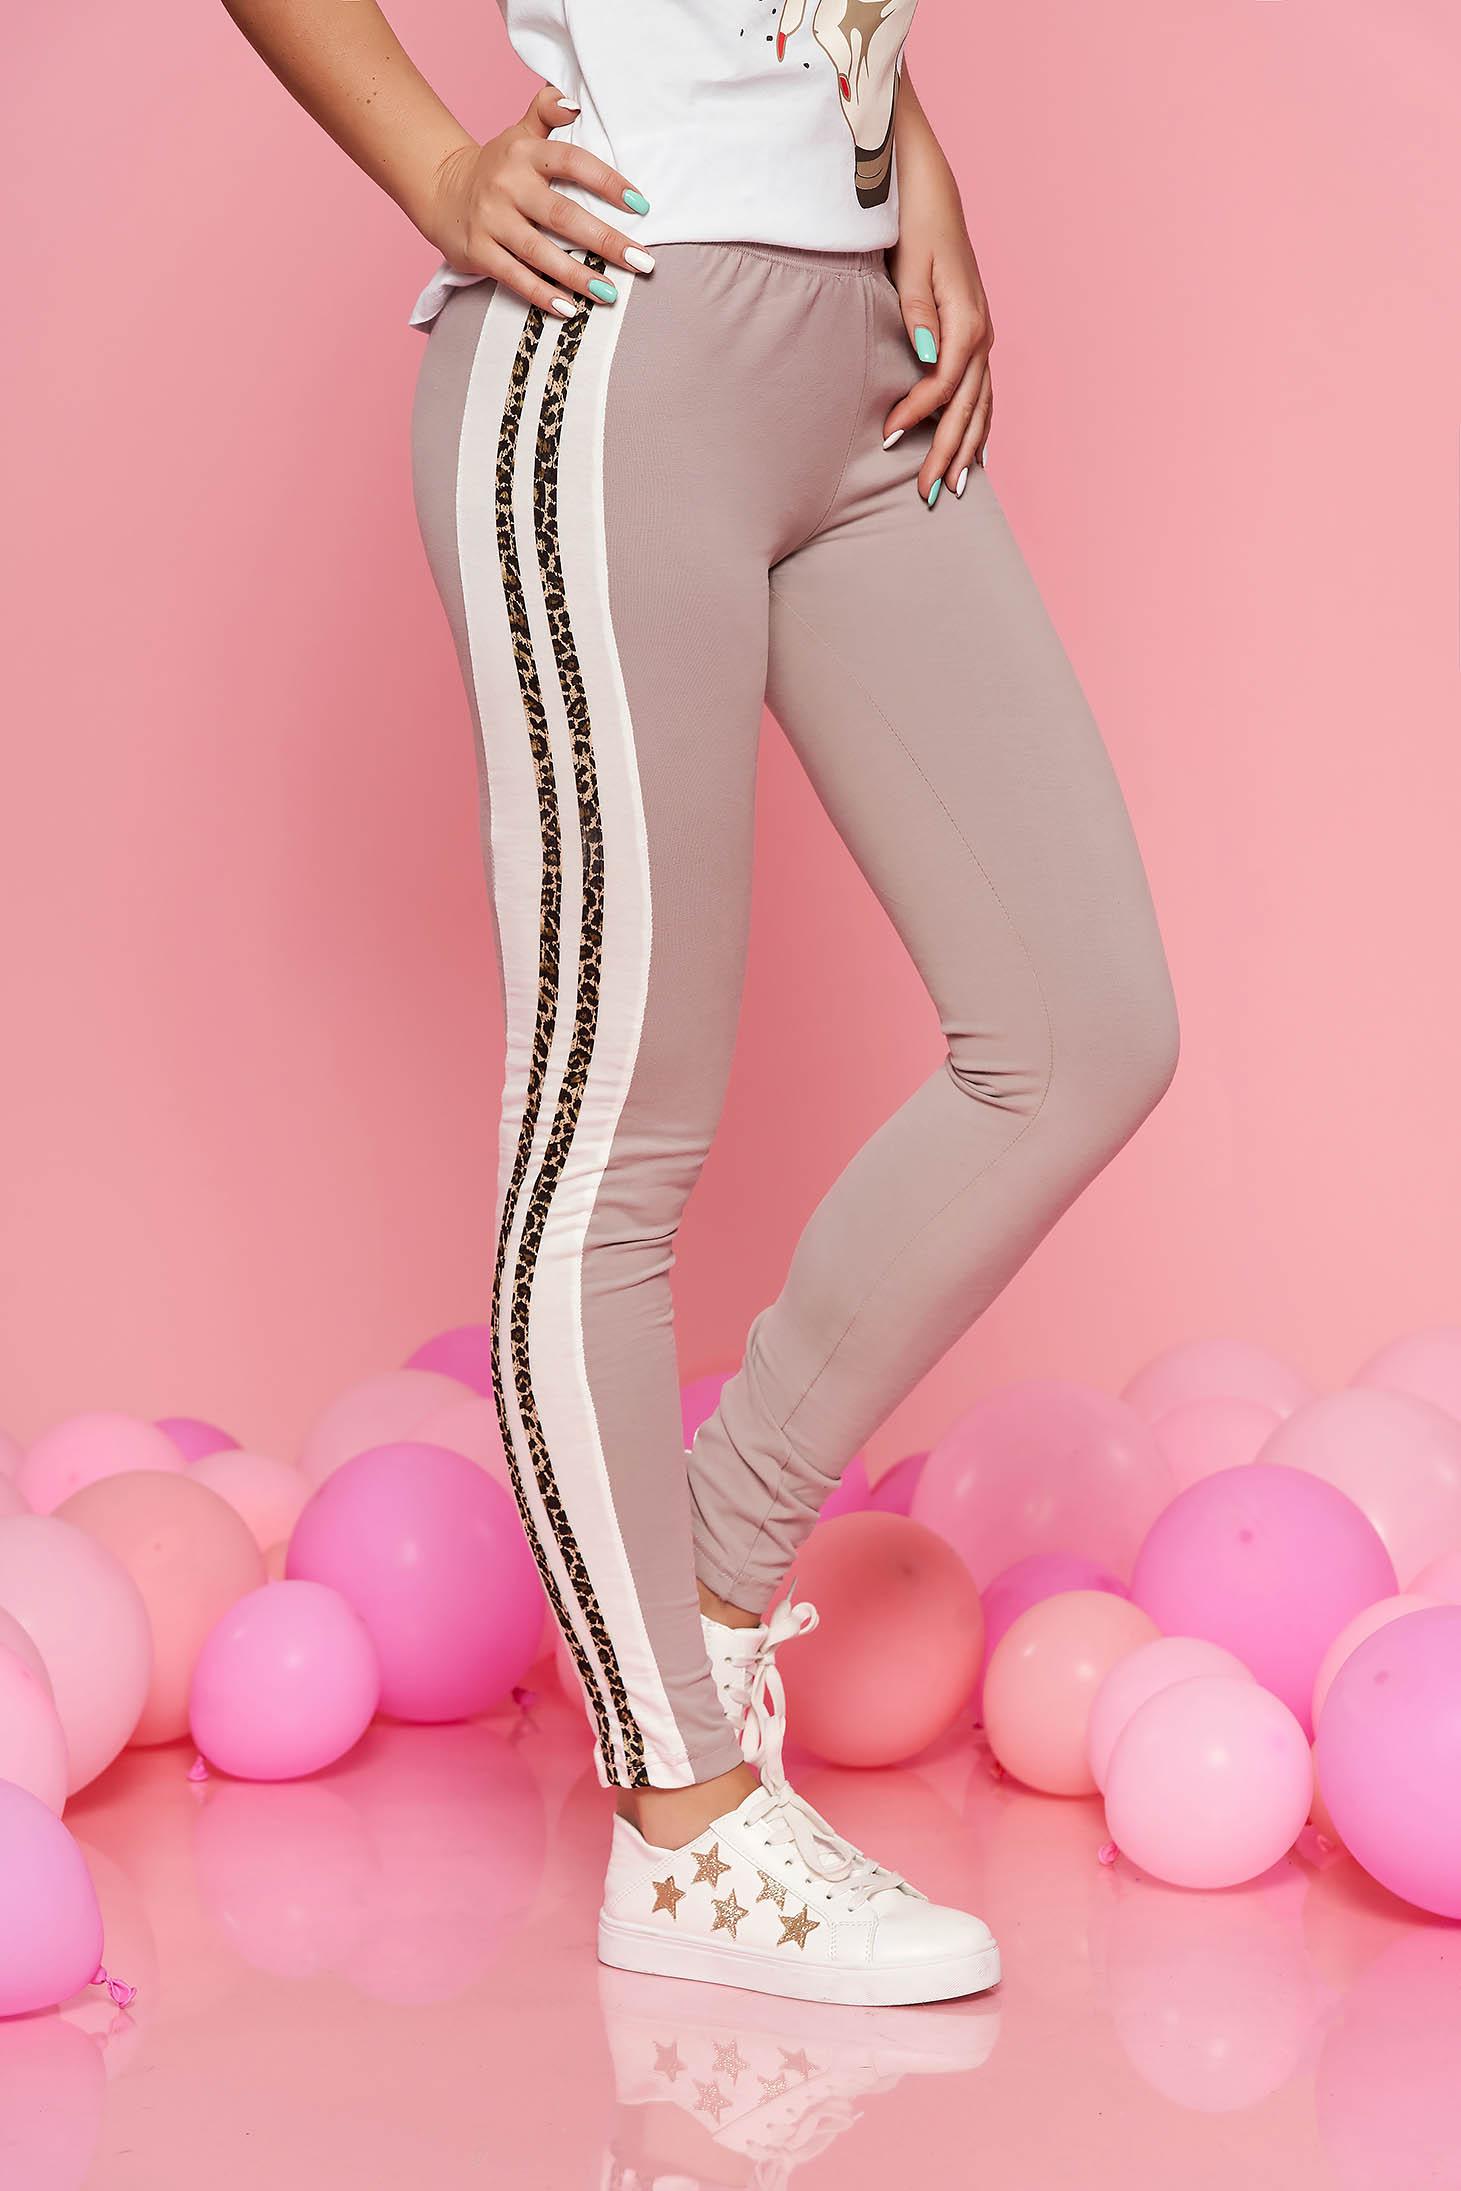 SunShine cream sporty tights with medium waist slightly elastic cotton with elastic waist